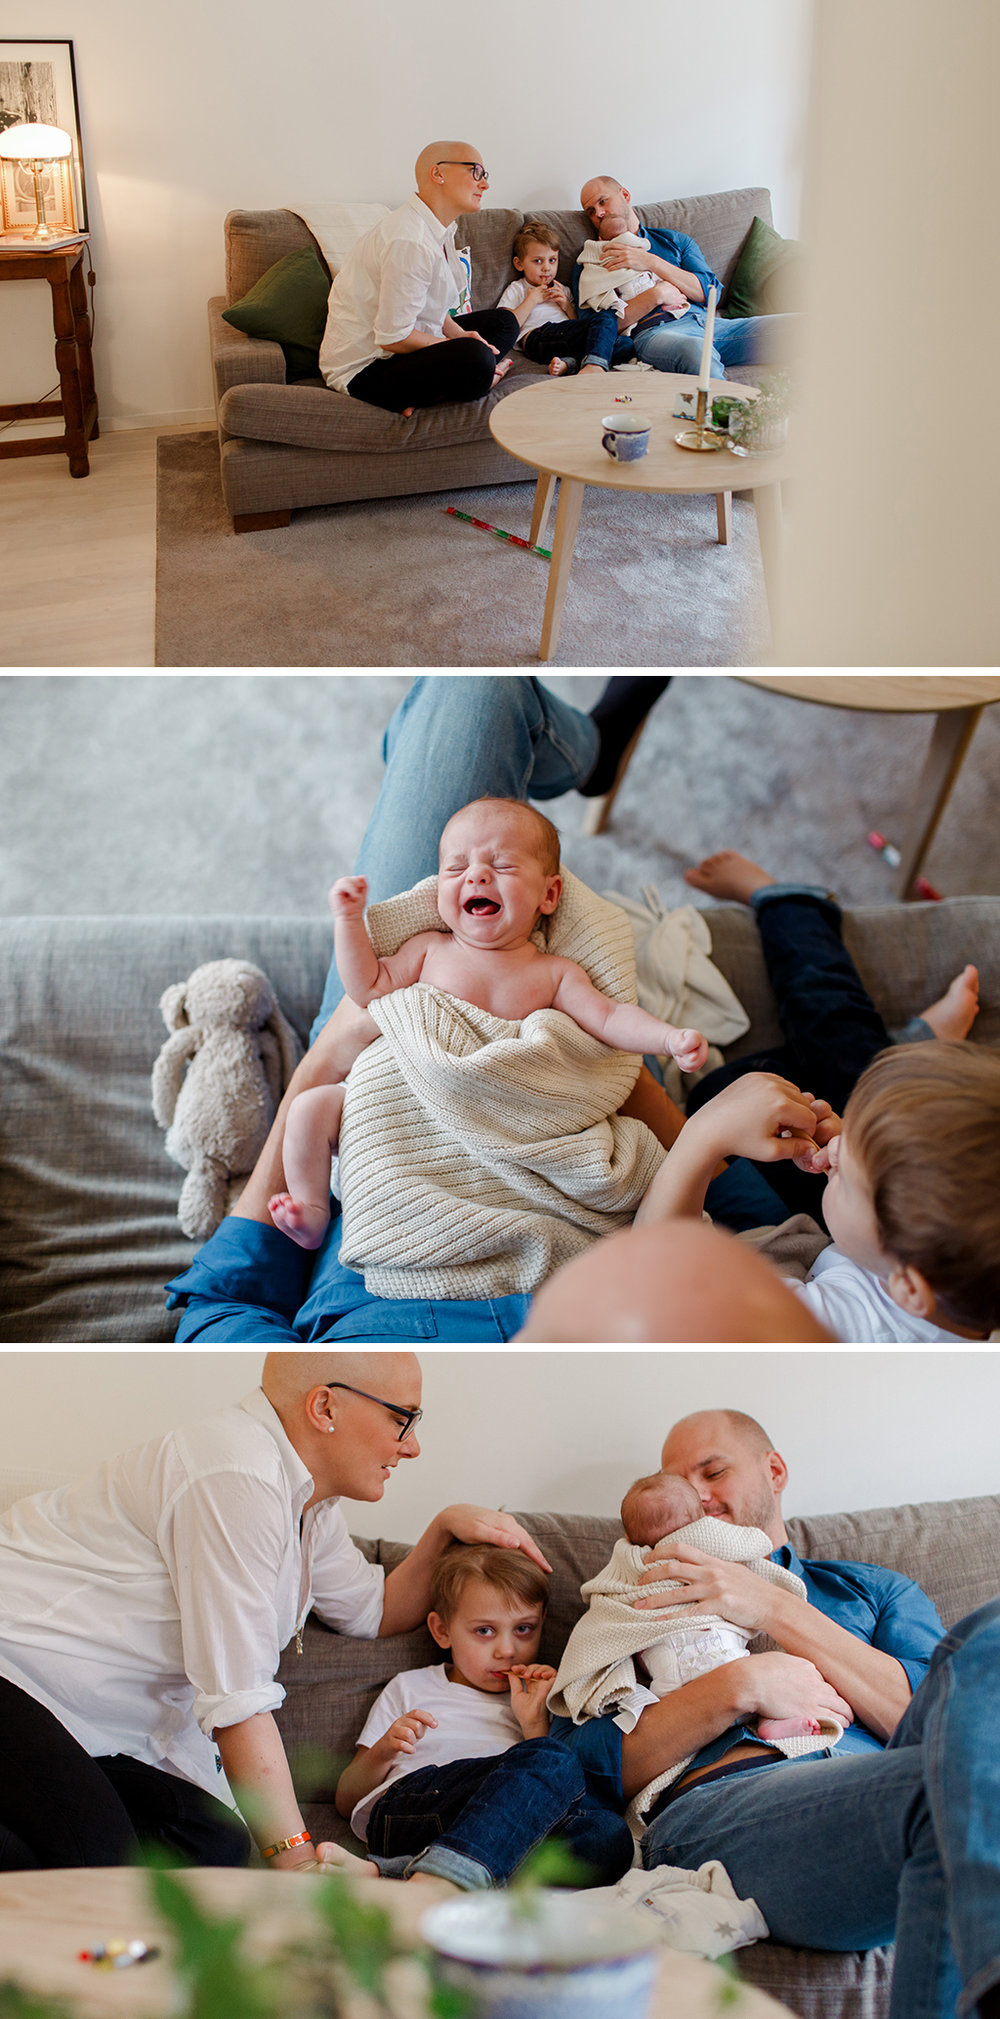 Lifestyle-nyfoddfotografering_newbornphotography_familjefotograf_Stockholm_16.jpg